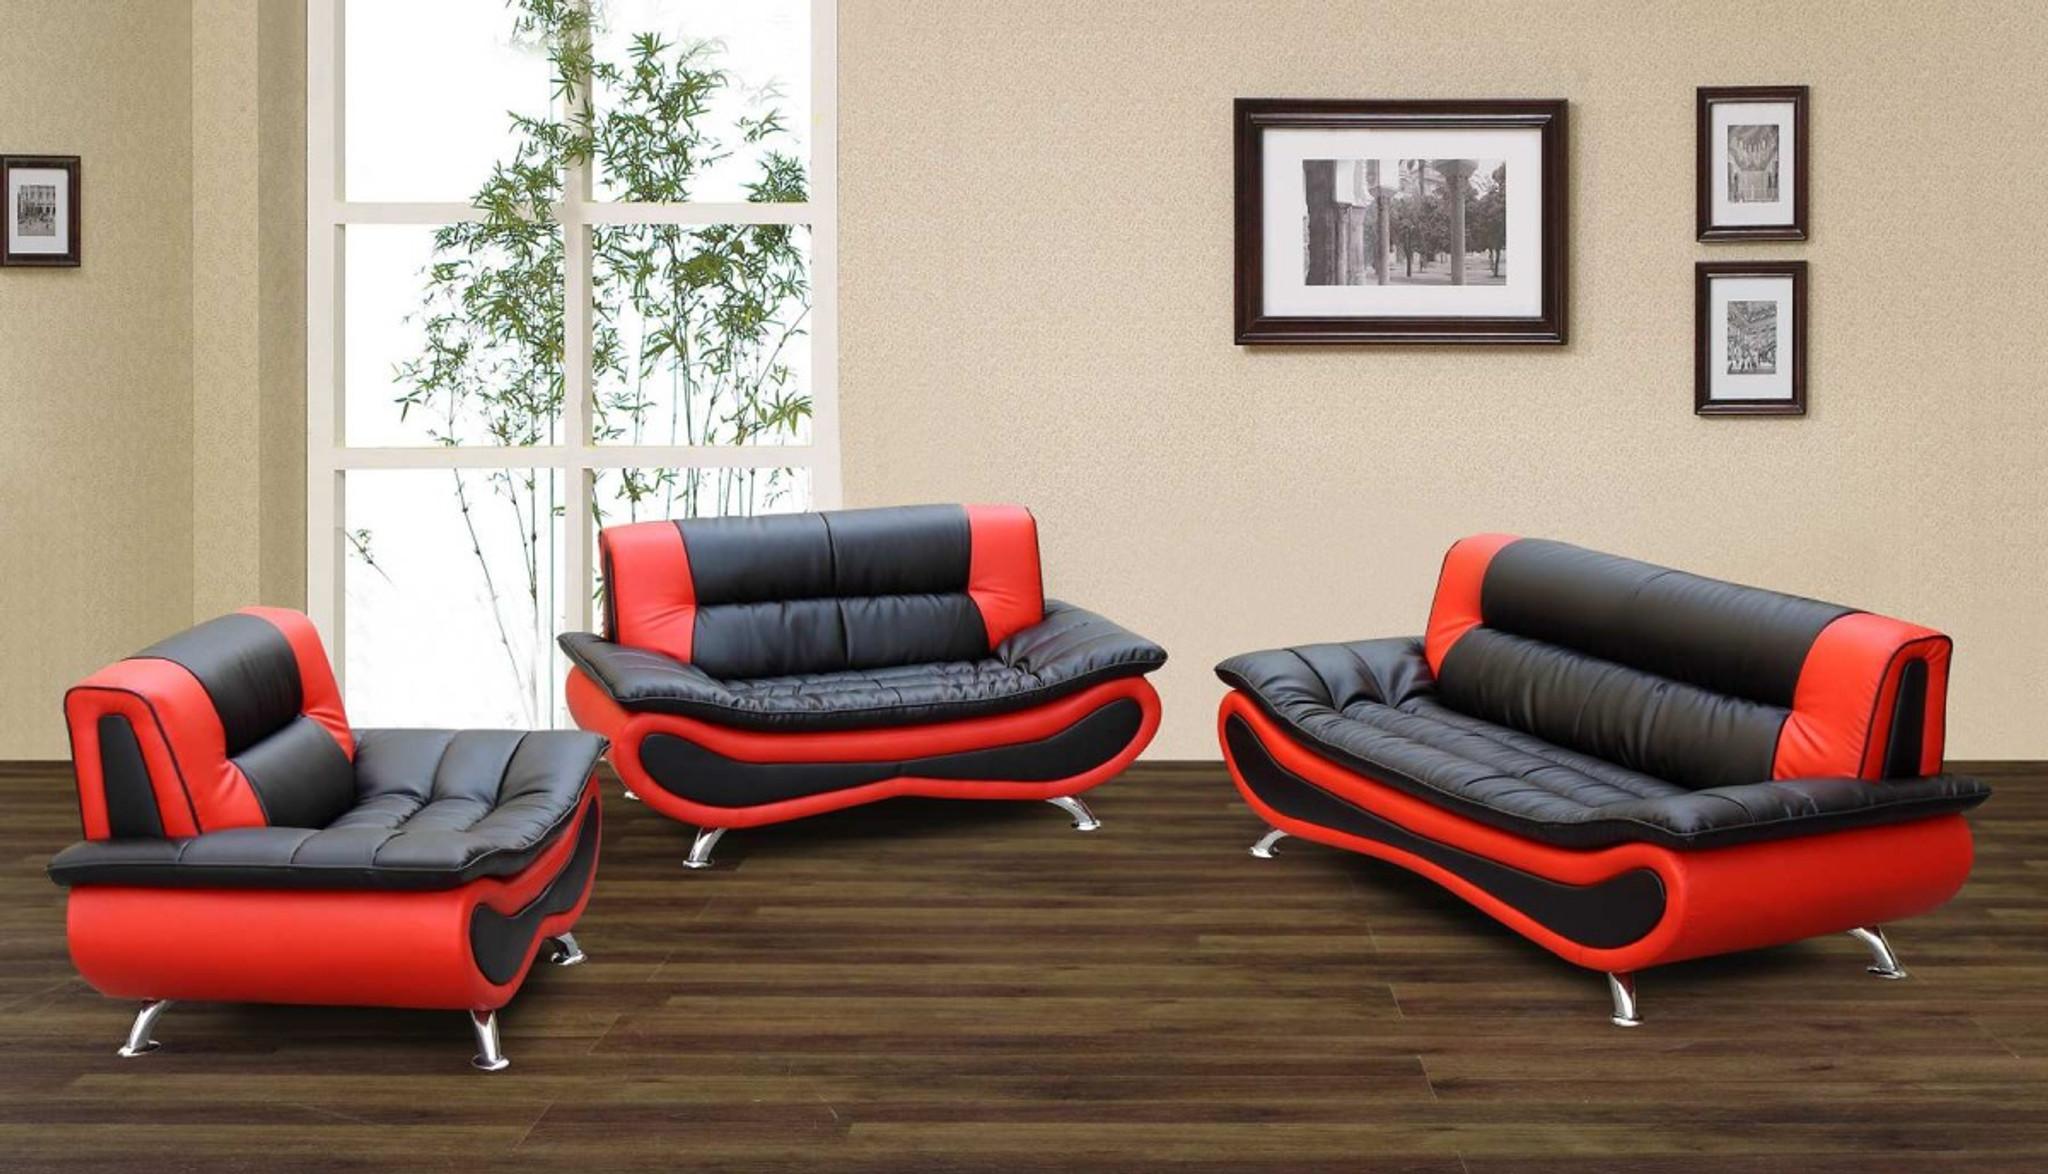 Logan Black And Orange Sofa Loveseat With Chair 3 Pcs Set